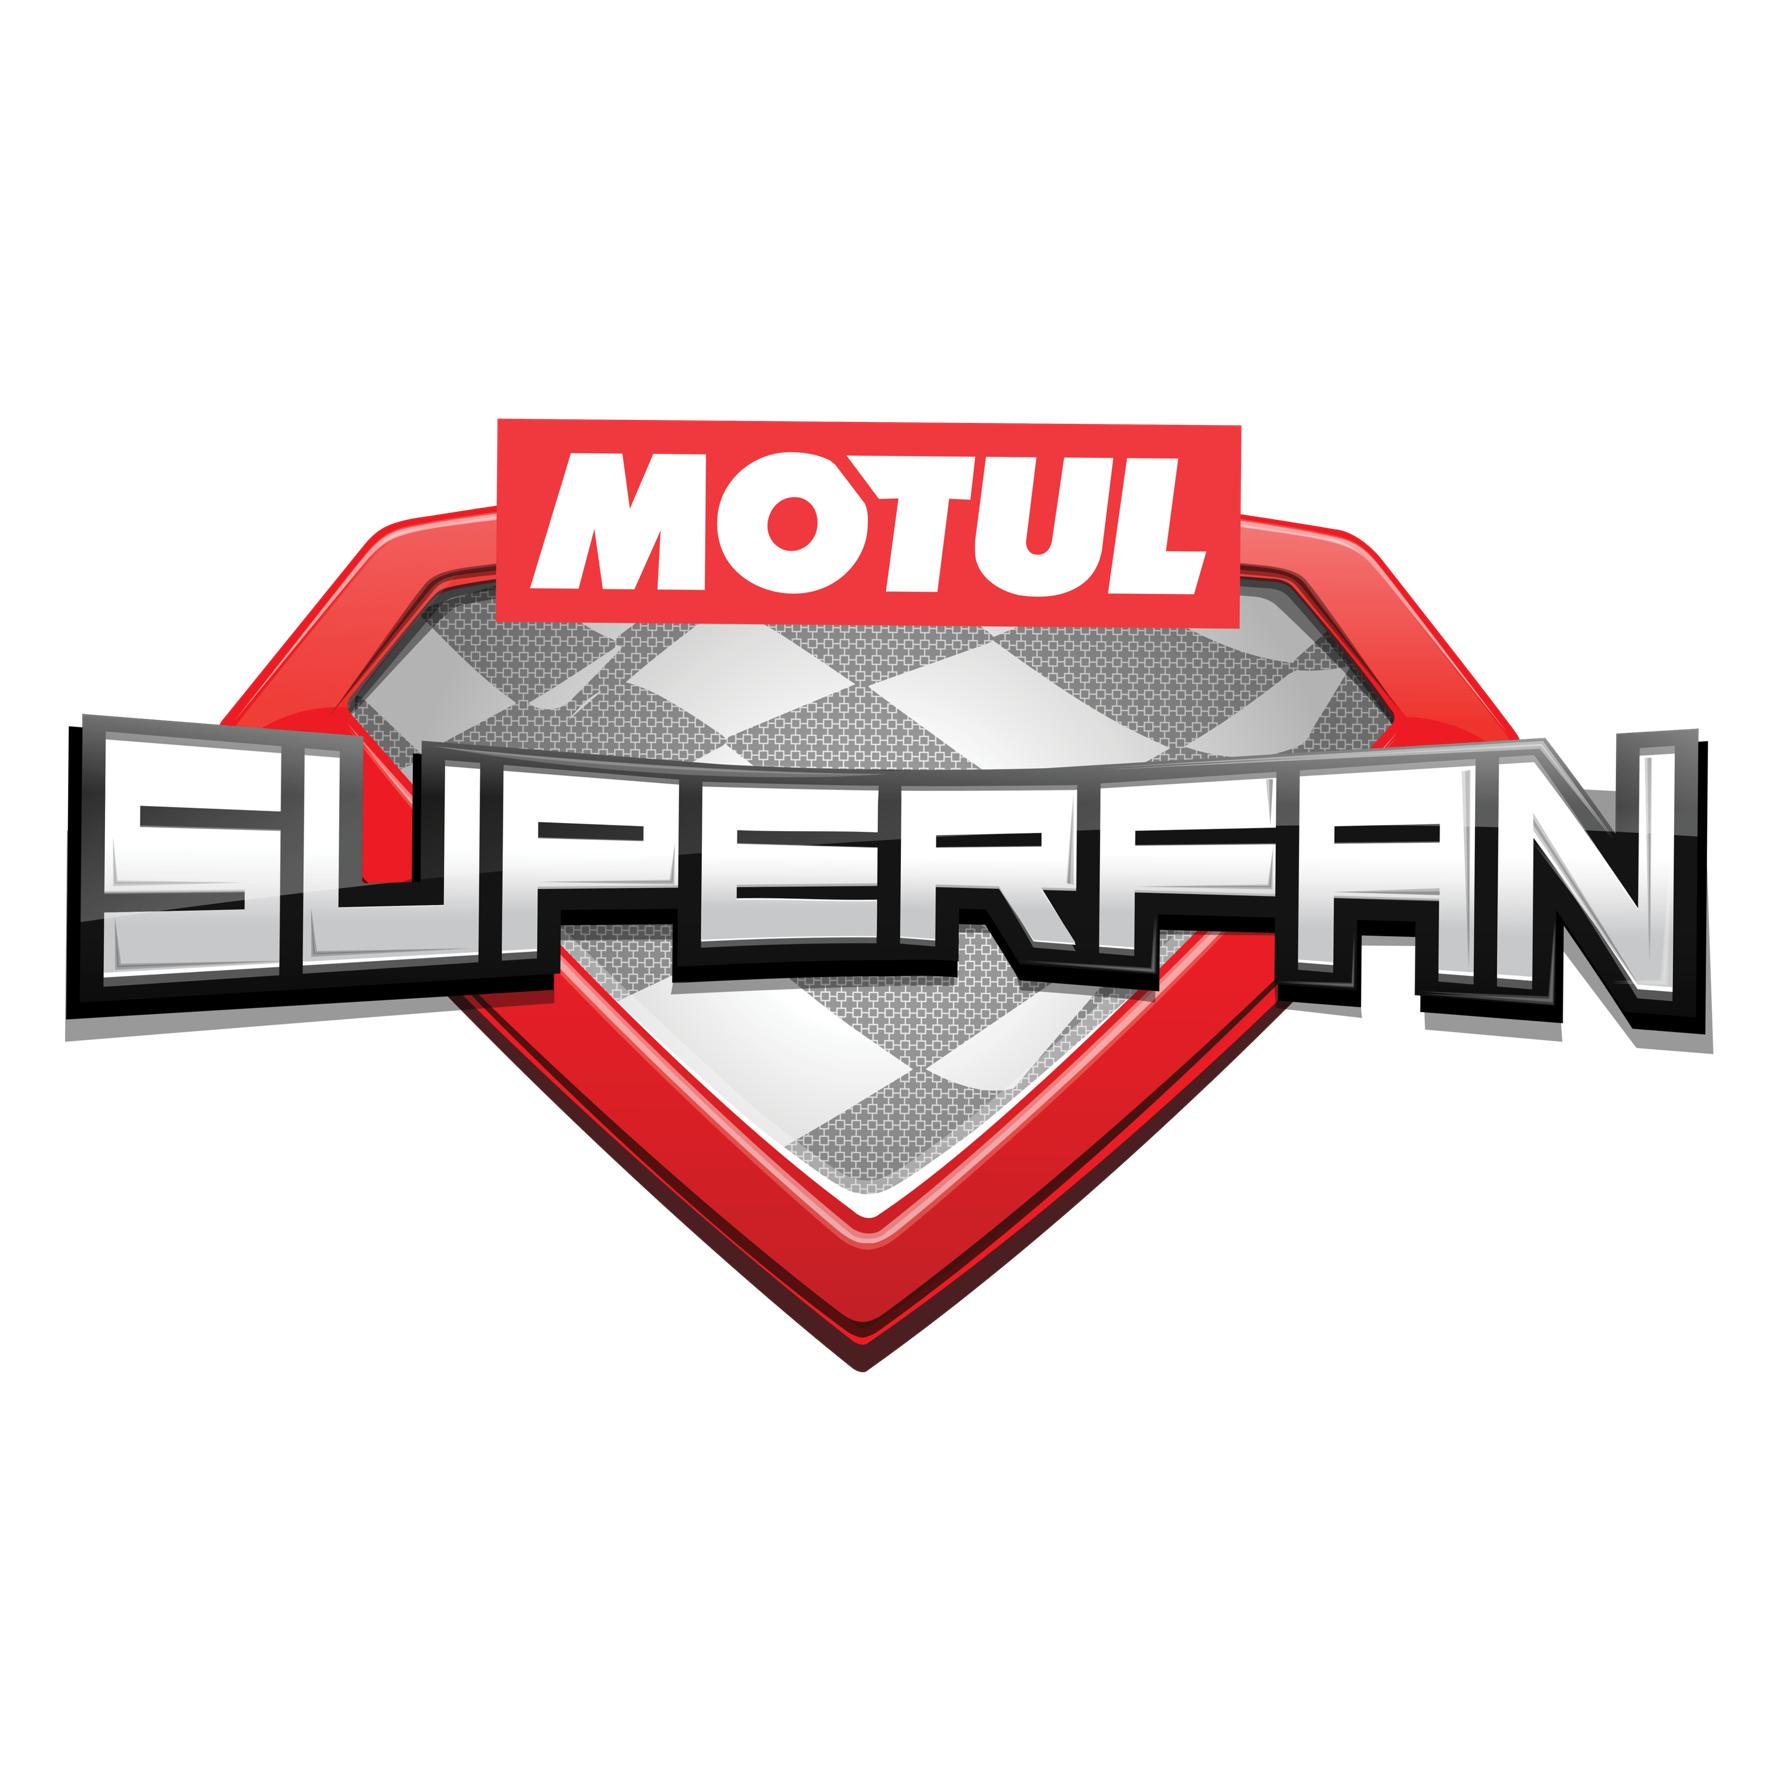 MOTOGP™ READY TO WELCOME MOTUL SUPERFAN COMMITTEE AT MOTUL TT ASSEN